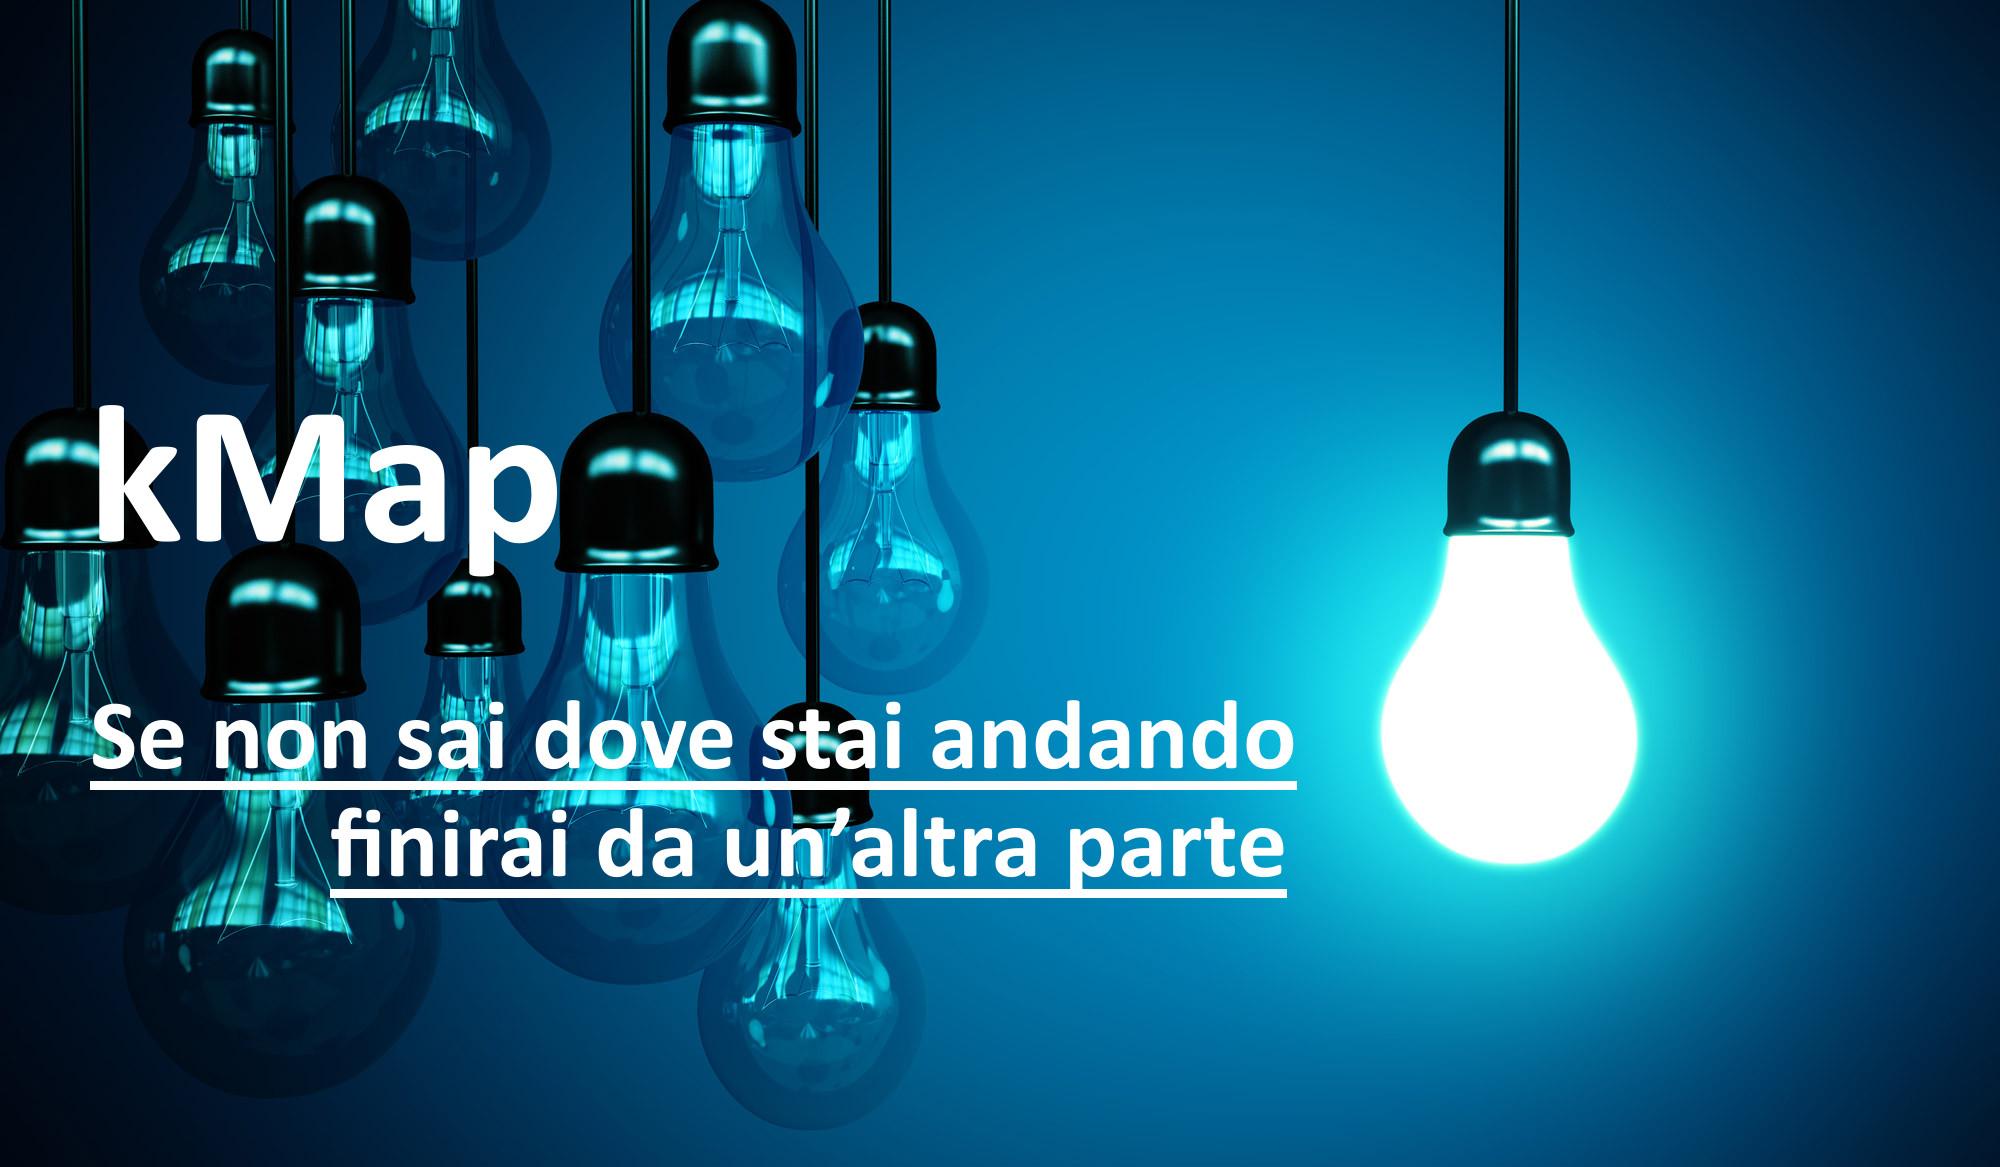 Kmap header 3